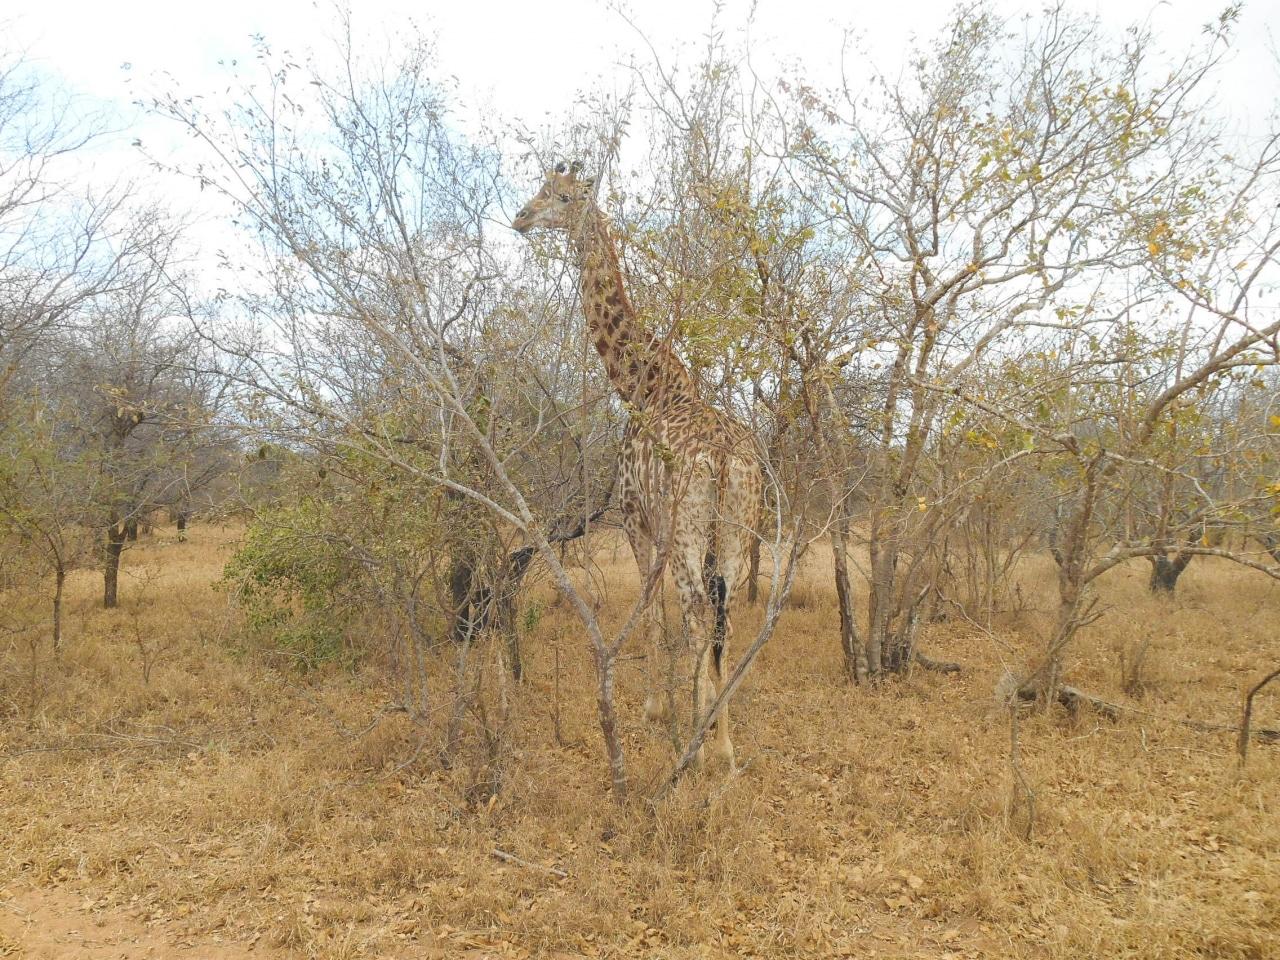 safari arrivee (3 sur 5)